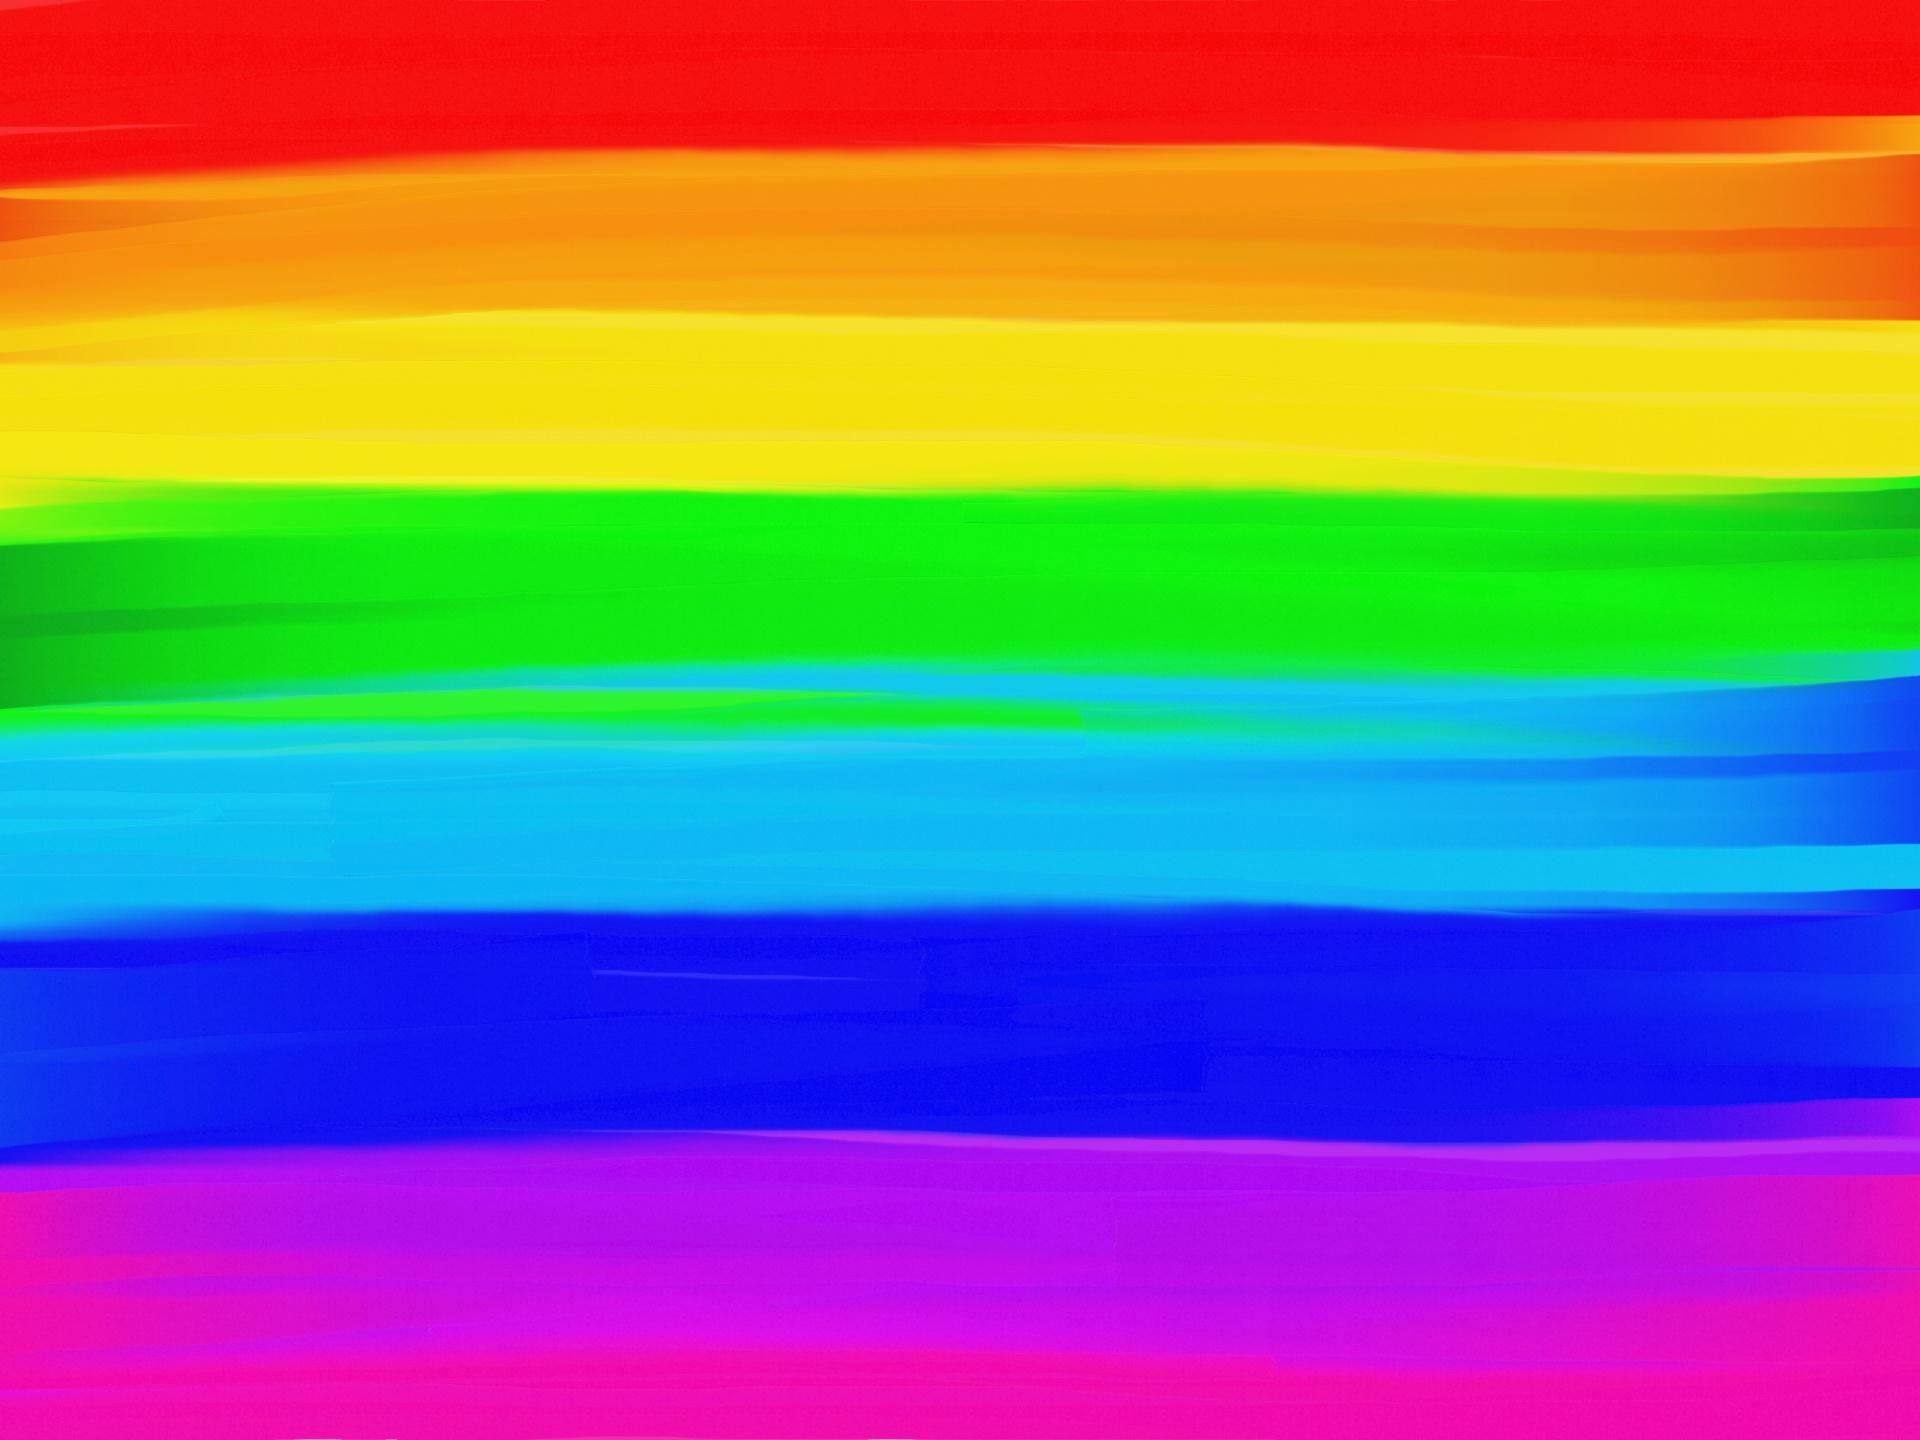 Cute Dog Christmas Pics Wallpaper Free Photo Rainbow Stripes Rainbow Photoshop Stripe